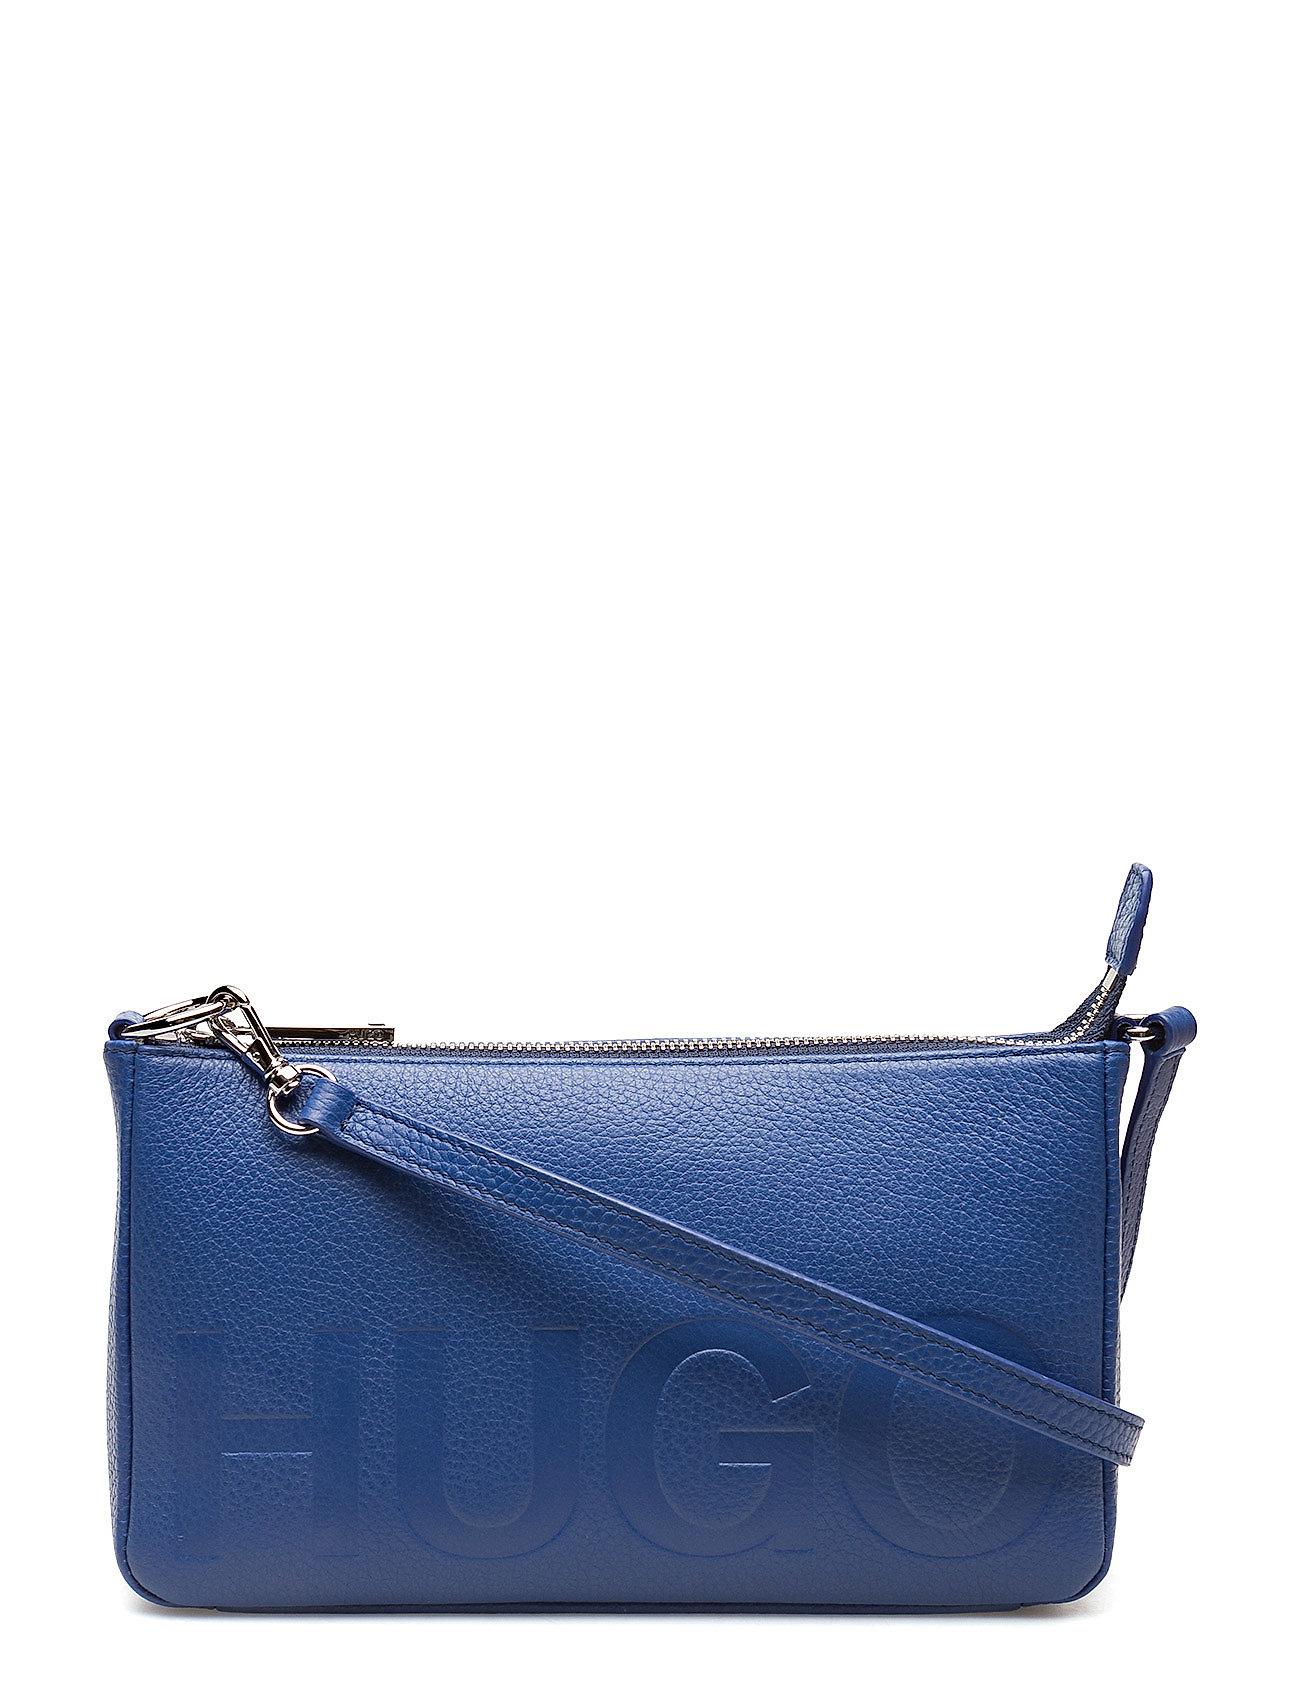 Mayfair Mini Bag - HUGO